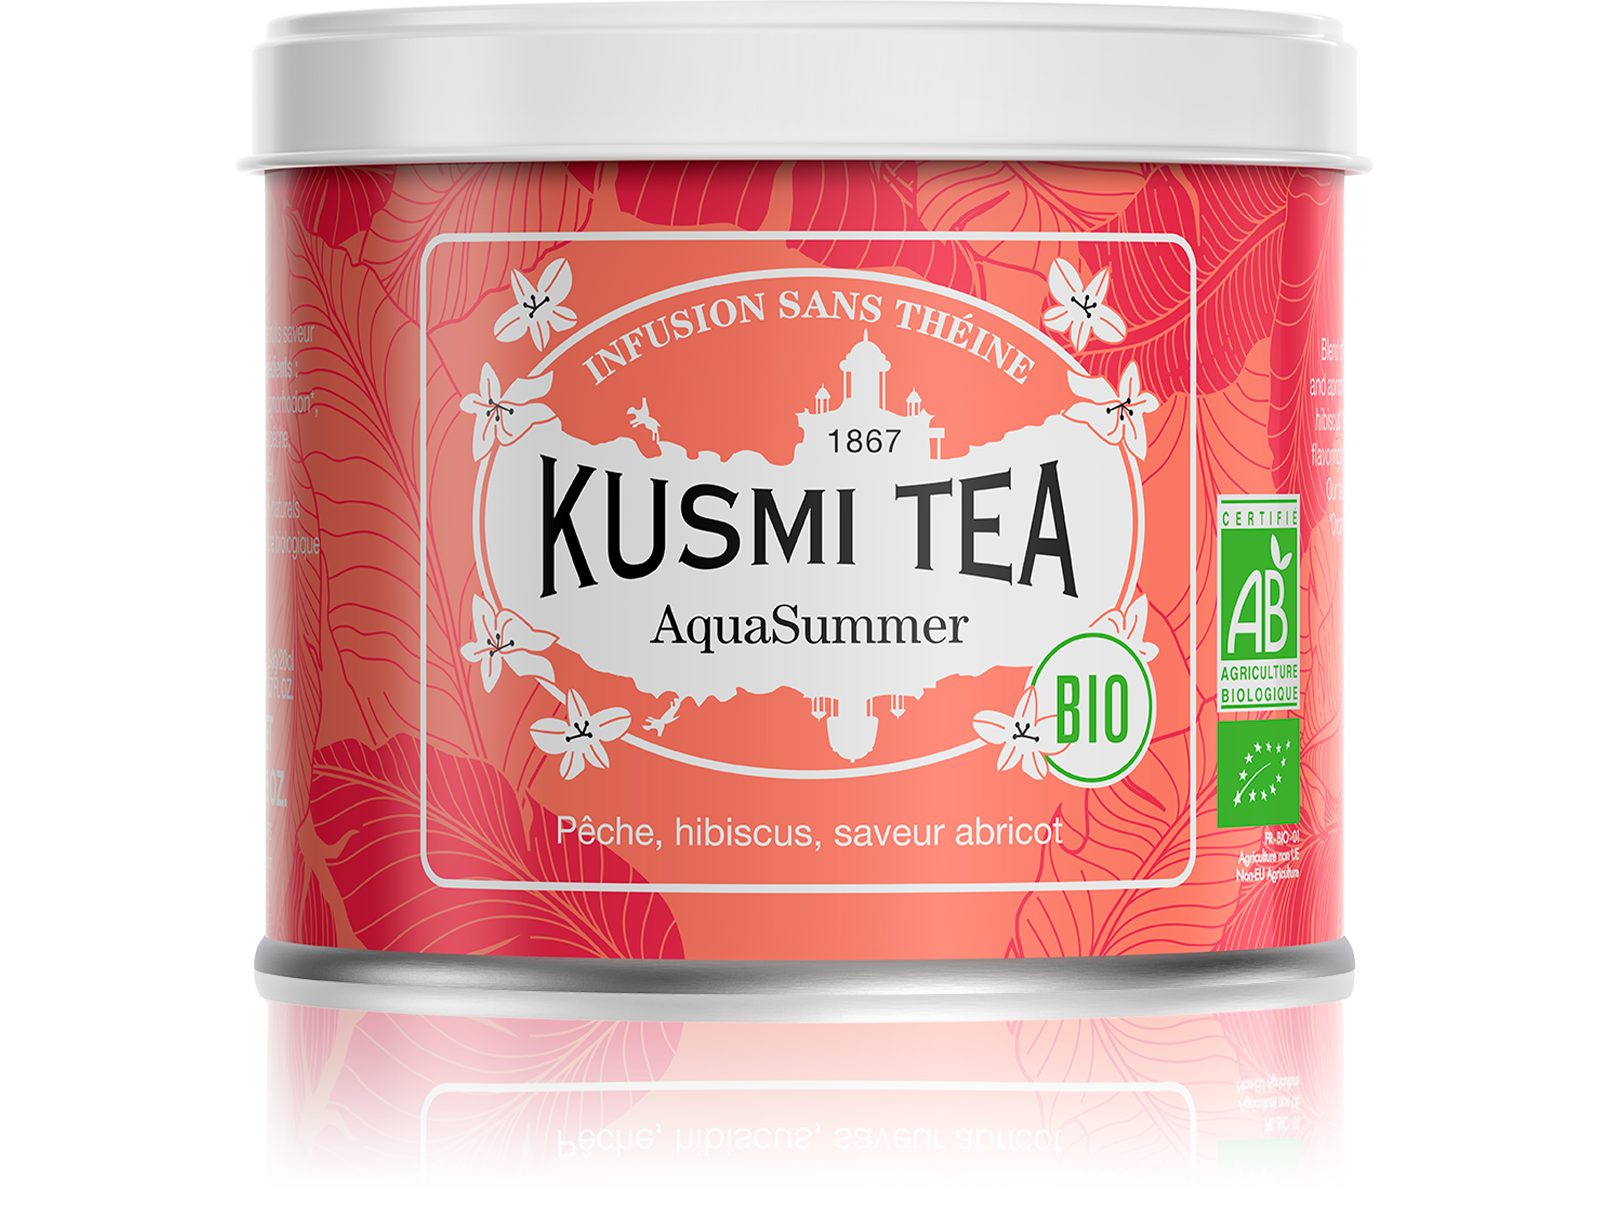 AquaSummer (Infusion de fruits bio) - Kusmi Tea